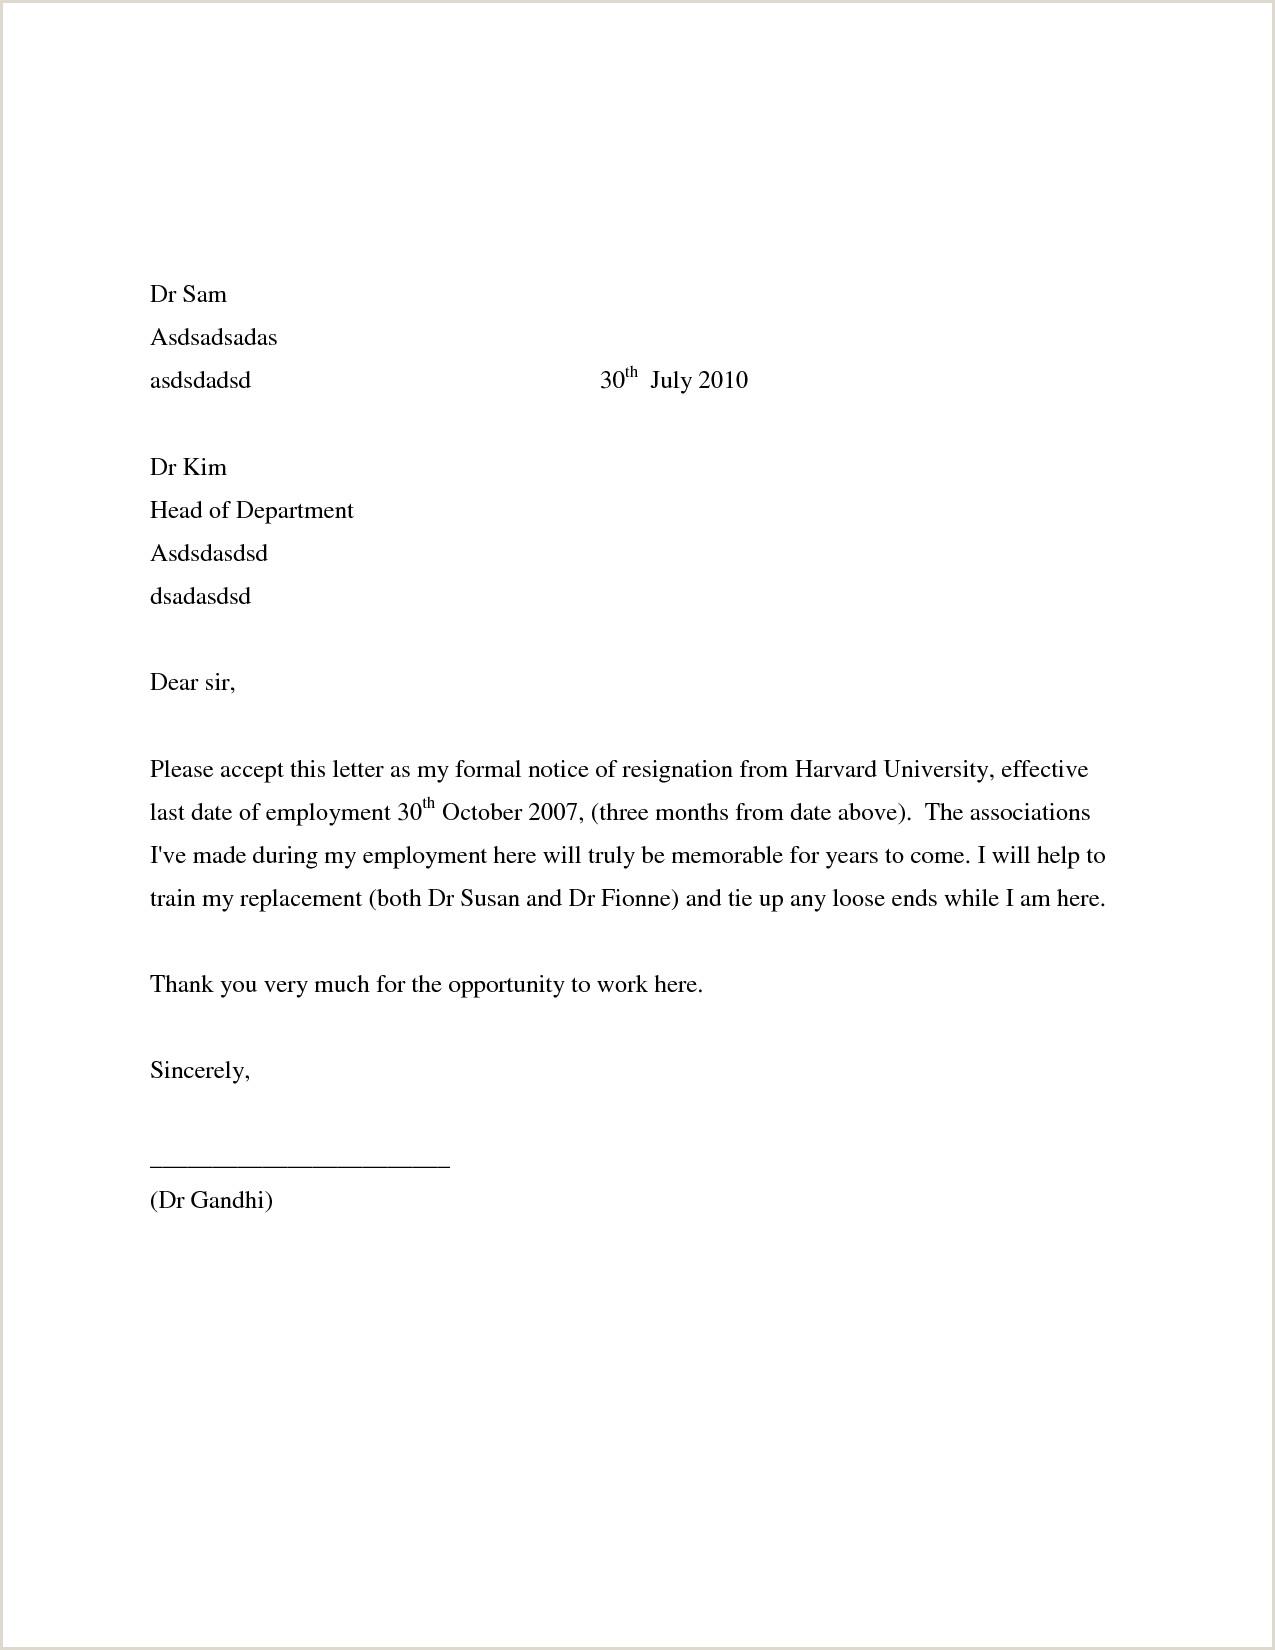 10 formal letters of resignation samples